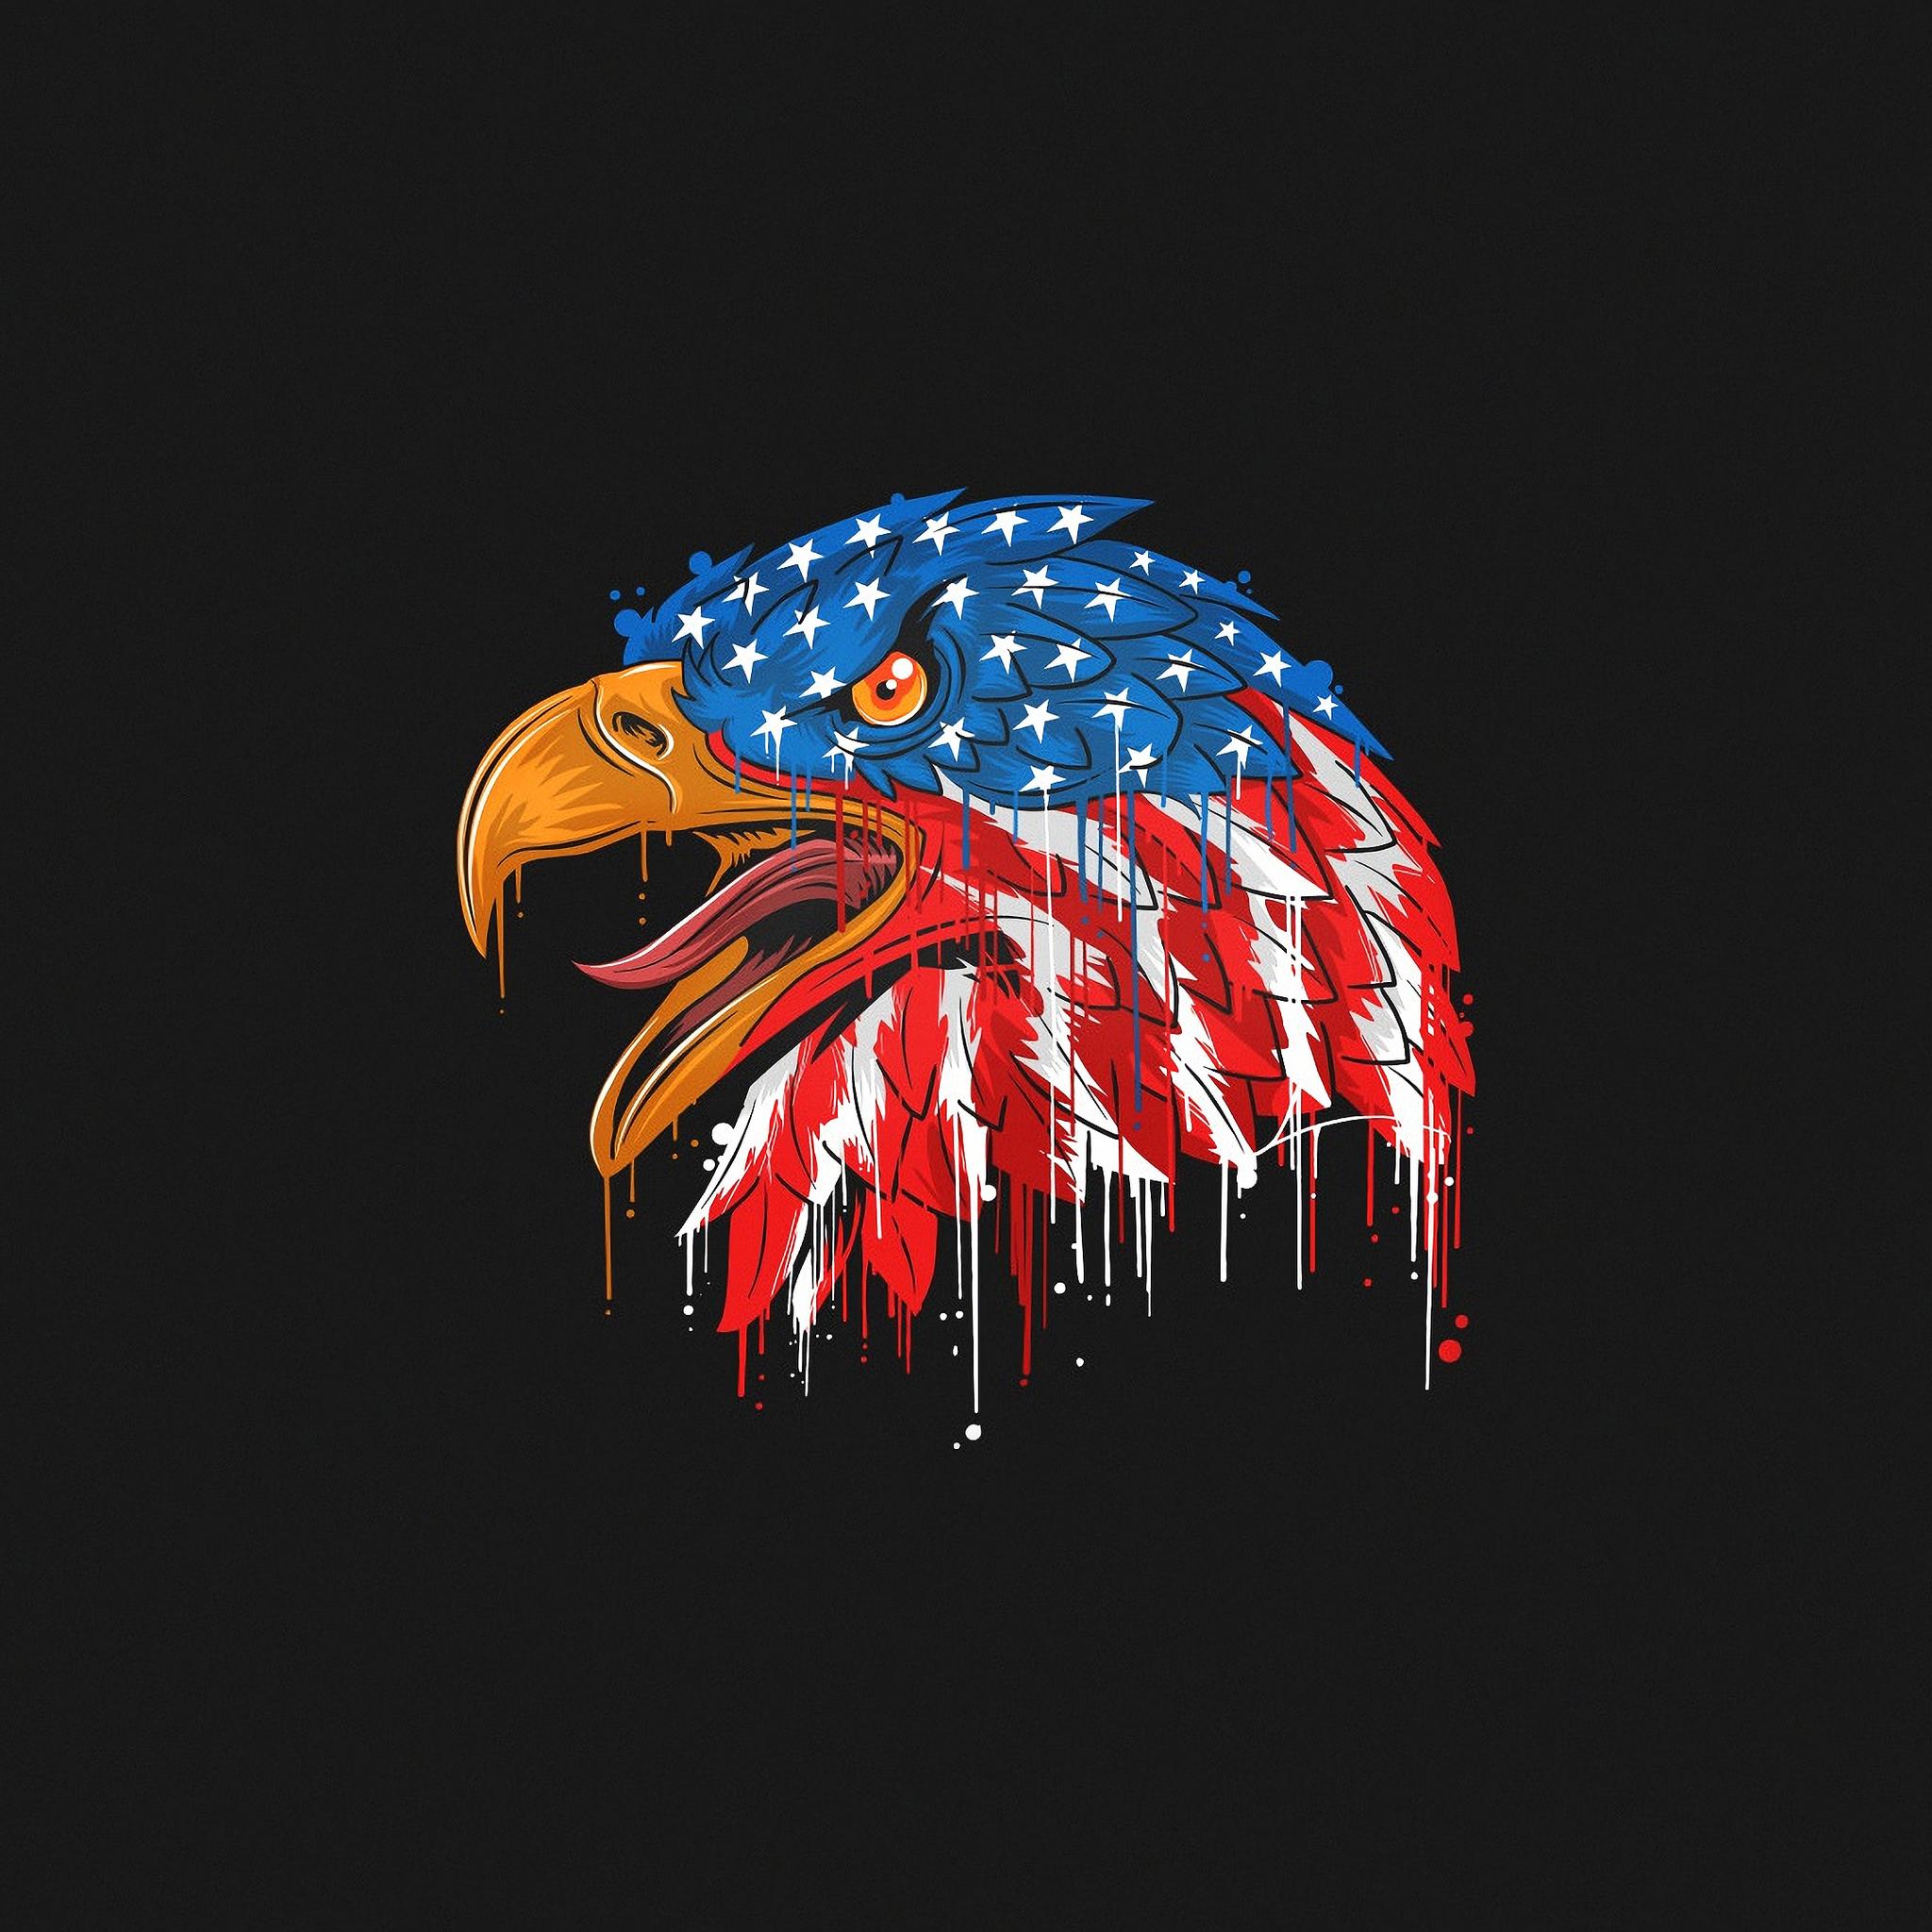 2048x2048 American Flag Eagle Minimal 4k Ipad Air Hd 4k Wallpapers